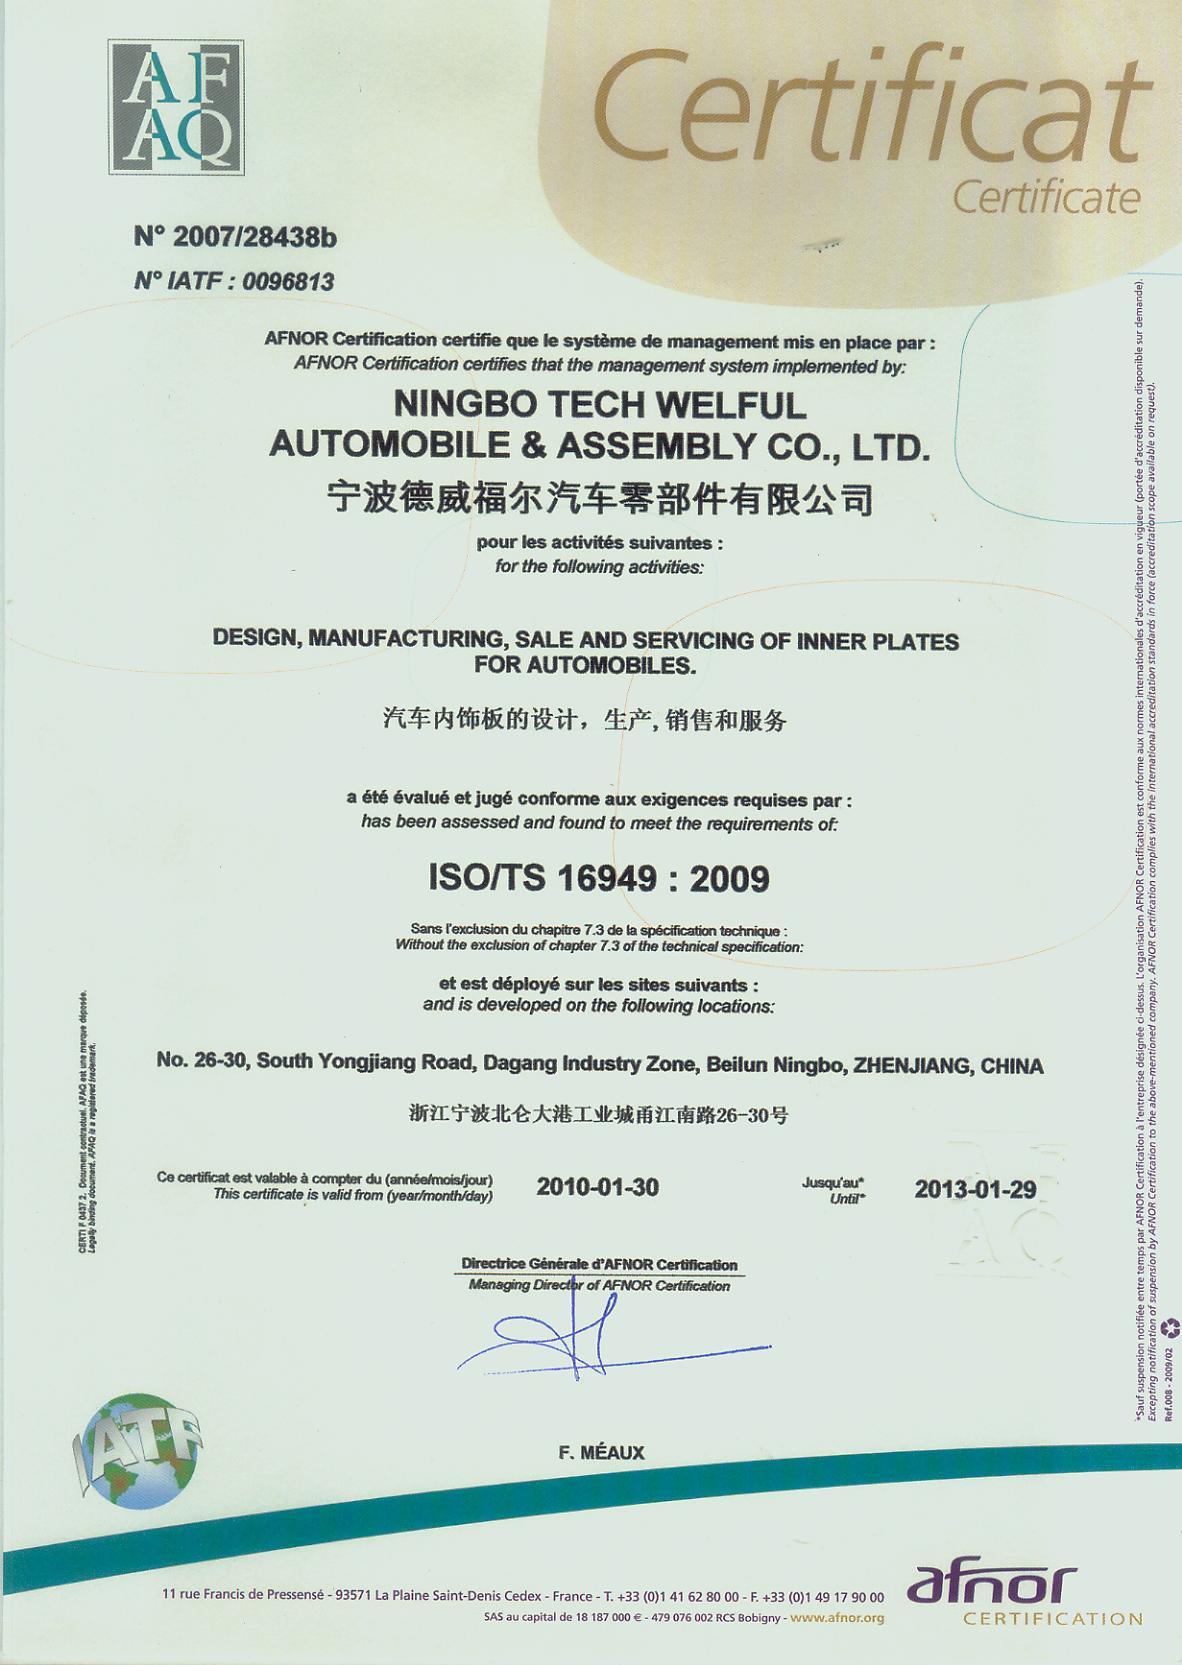 ISO/Ts 16949: 2009